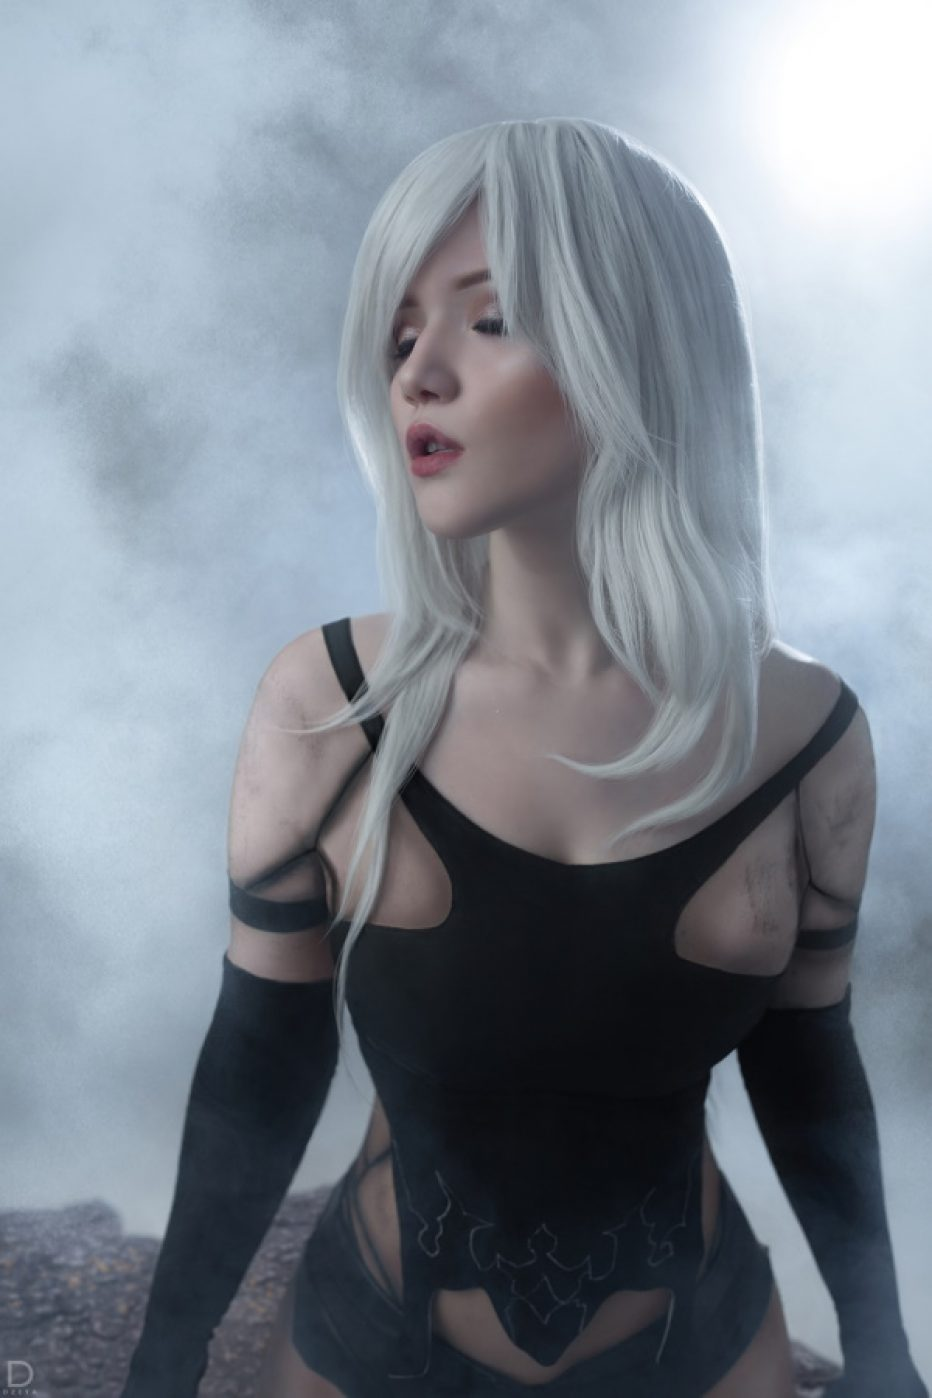 Nier-Automata-A2-Cosplay-Gamers-Heroes-4.jpg